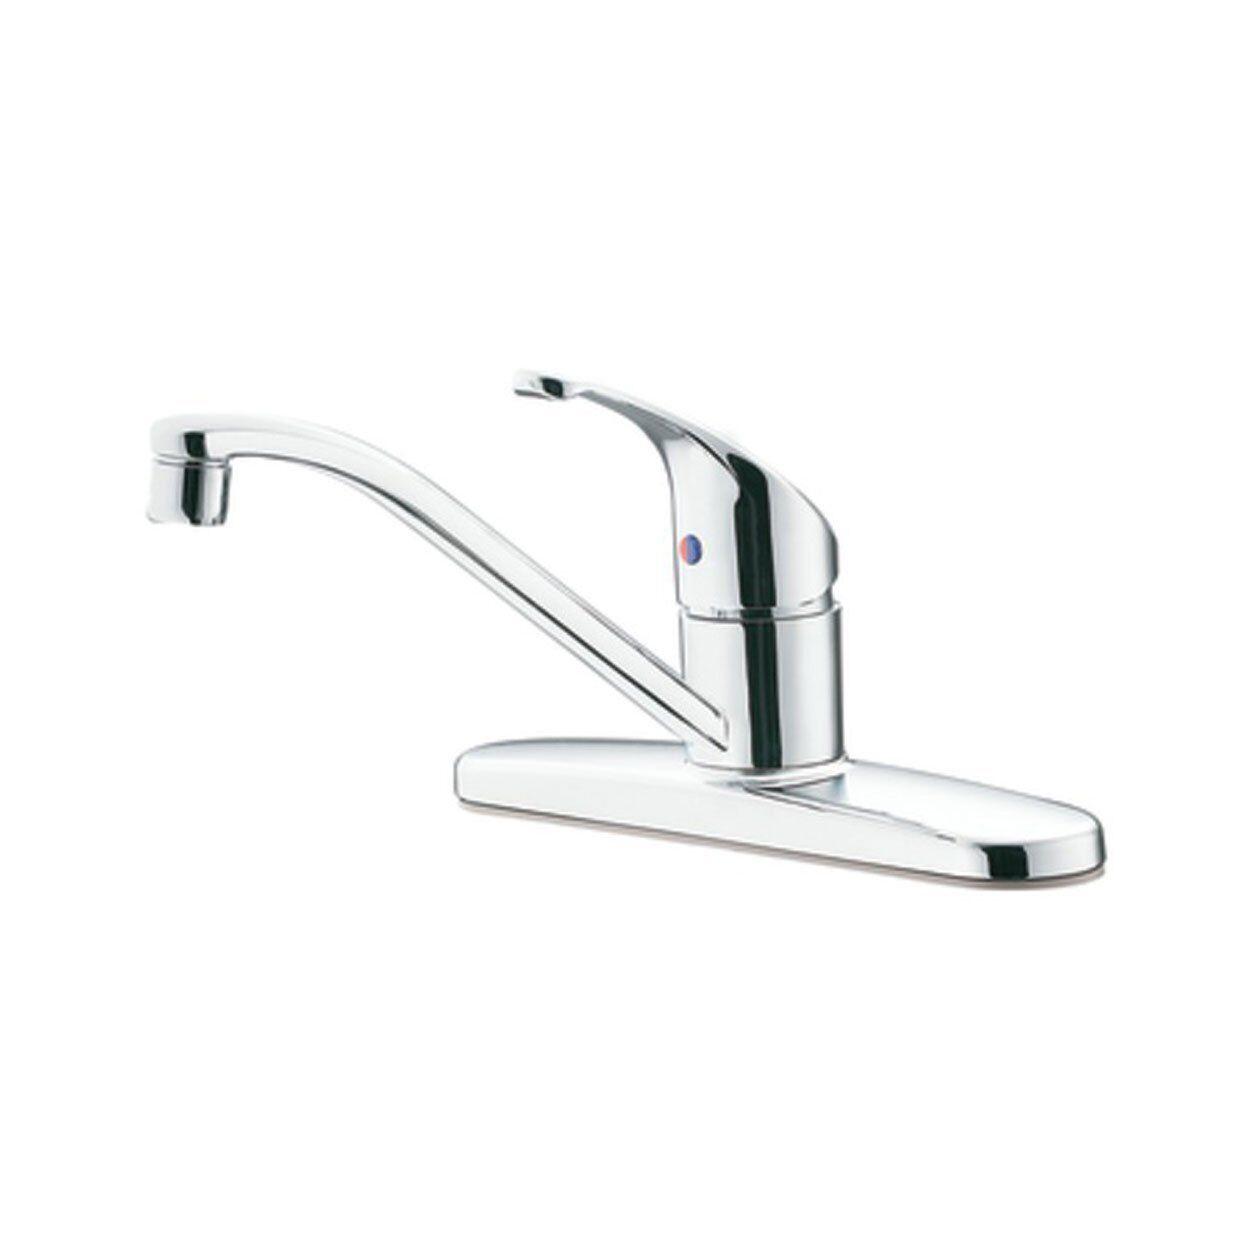 Moen CA47511 Flagstone 1 Handle Kitchen Faucet Chrome